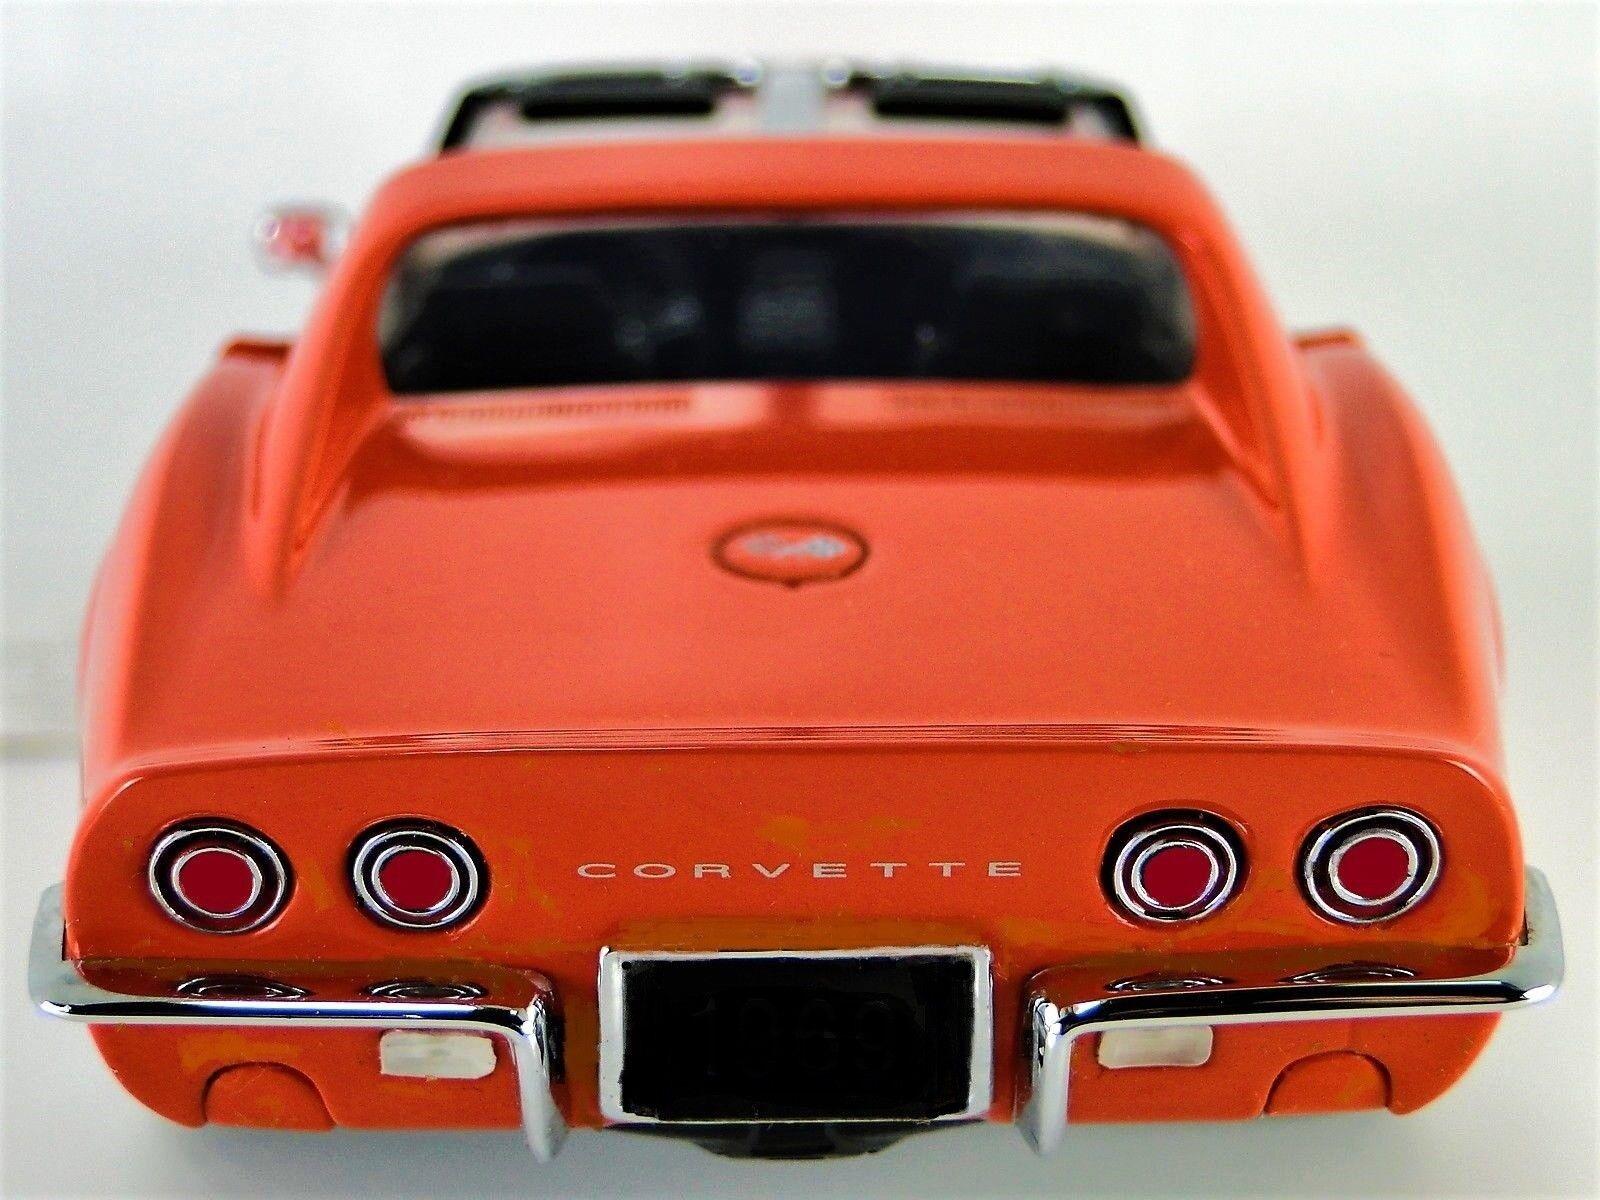 1970 Corvette 1 Chevrolet Built 16 Sport Sport Sport 20 Race 25 Car 24 Vintage 12 Model 18 b9f9dd